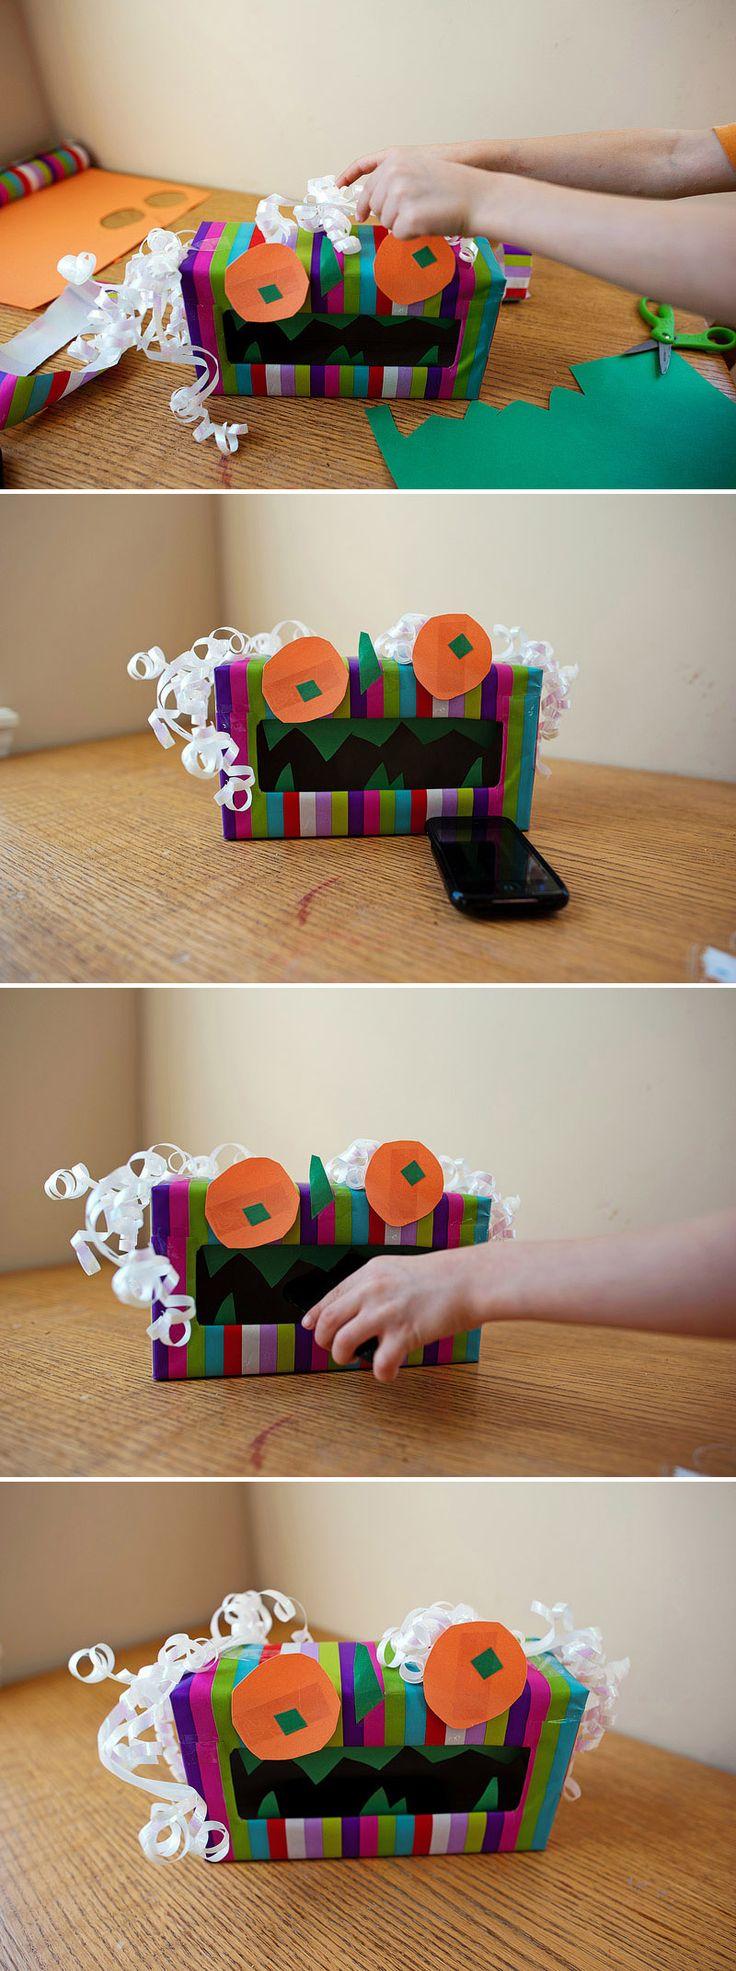 Cool remote holder!